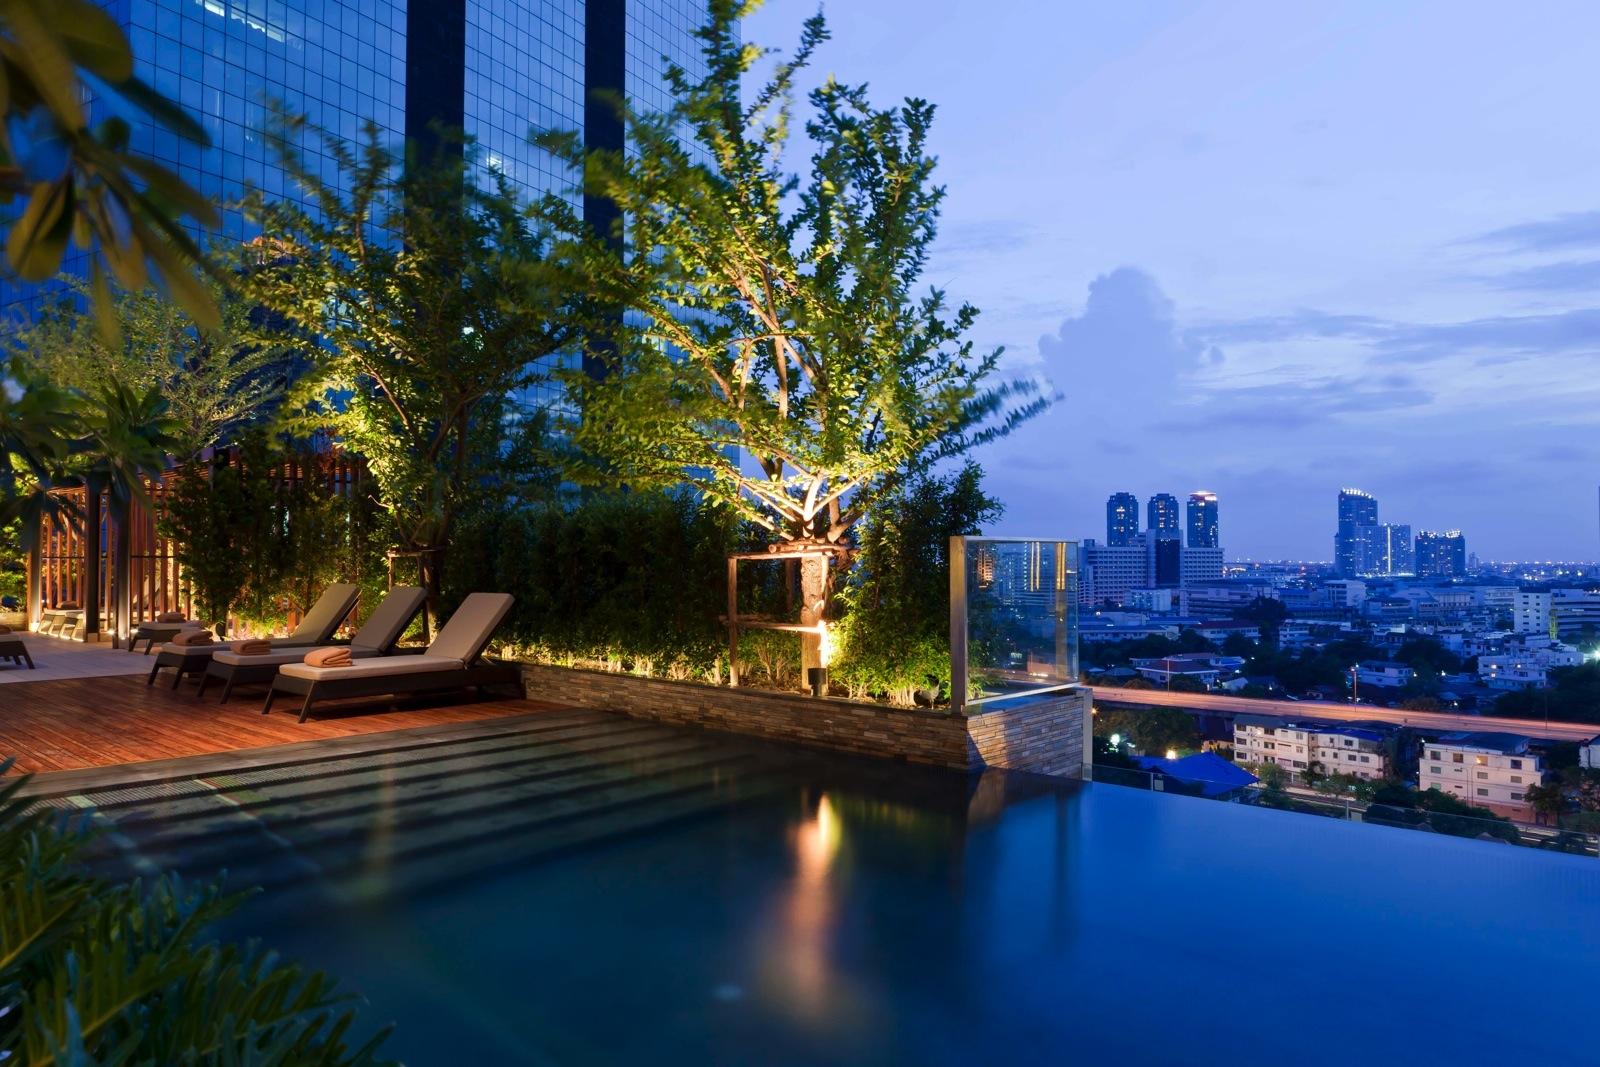 eastin-sathorn-rooftop-pool-bangkok-hotel